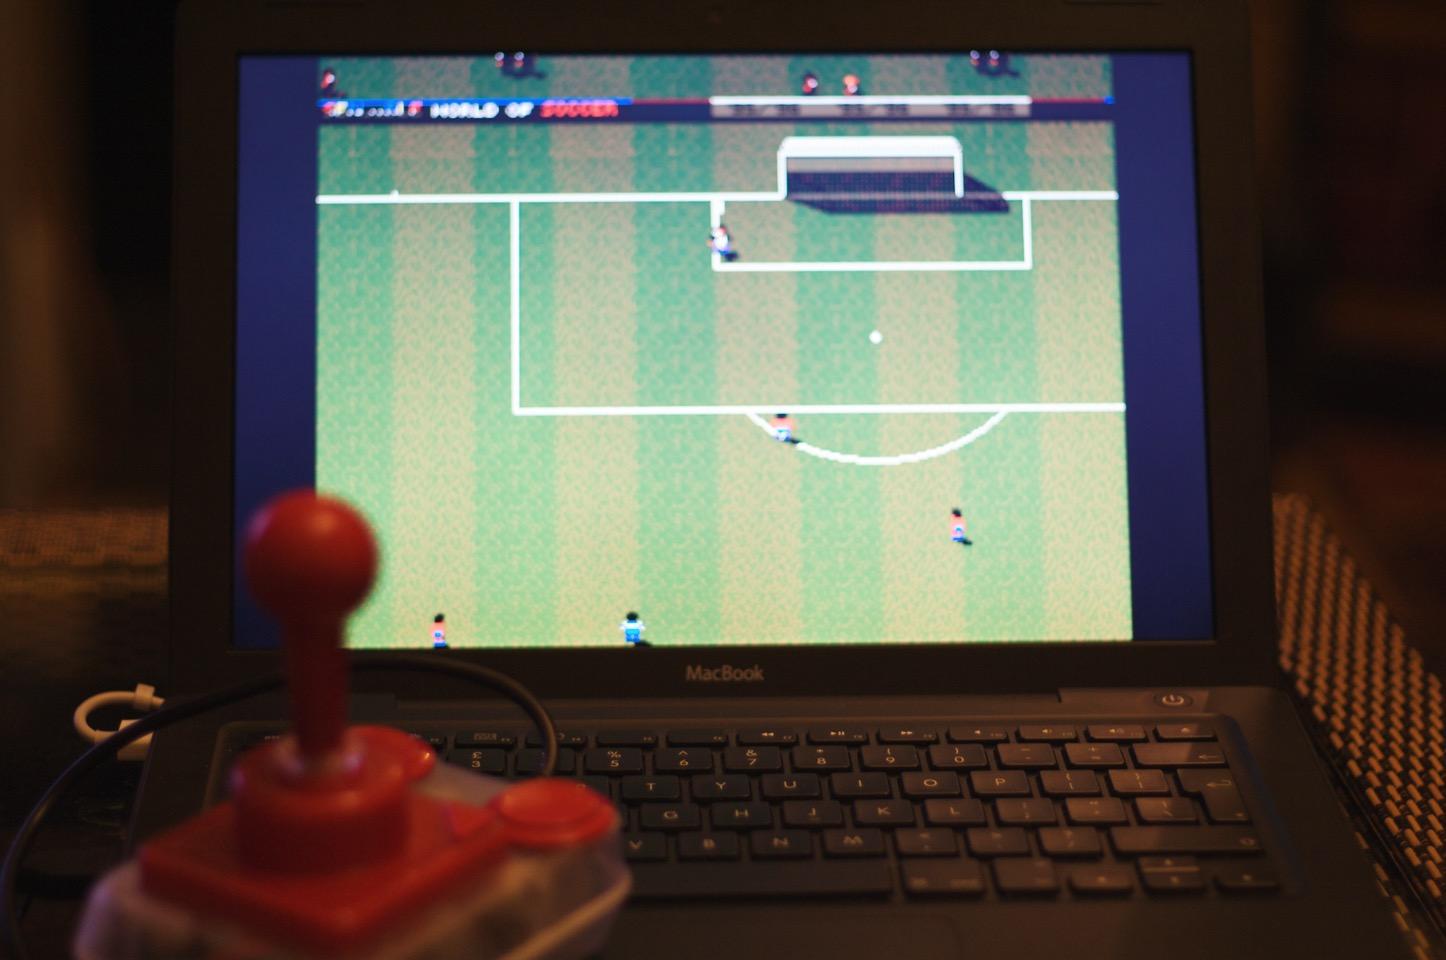 Soccer macbook